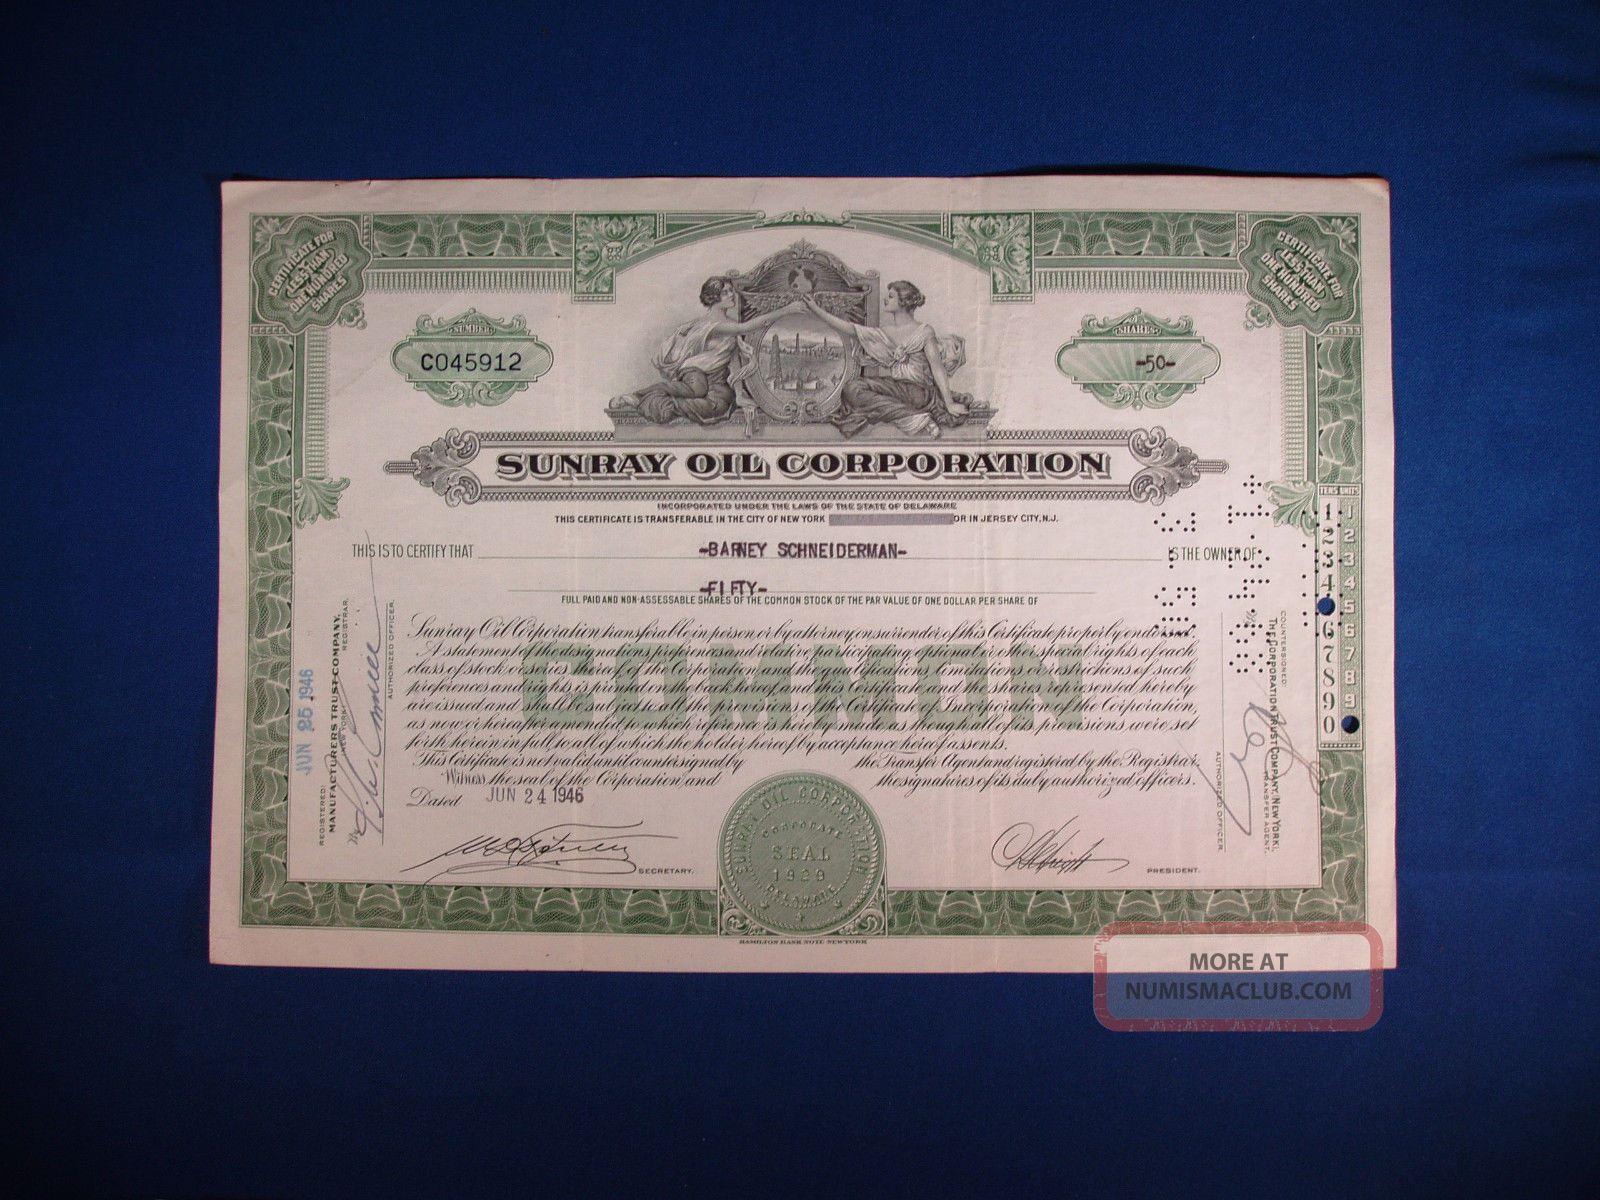 Sunray Oil Corporation Stock Certificate,  50 Share Certificate. Stocks & Bonds, Scripophily photo